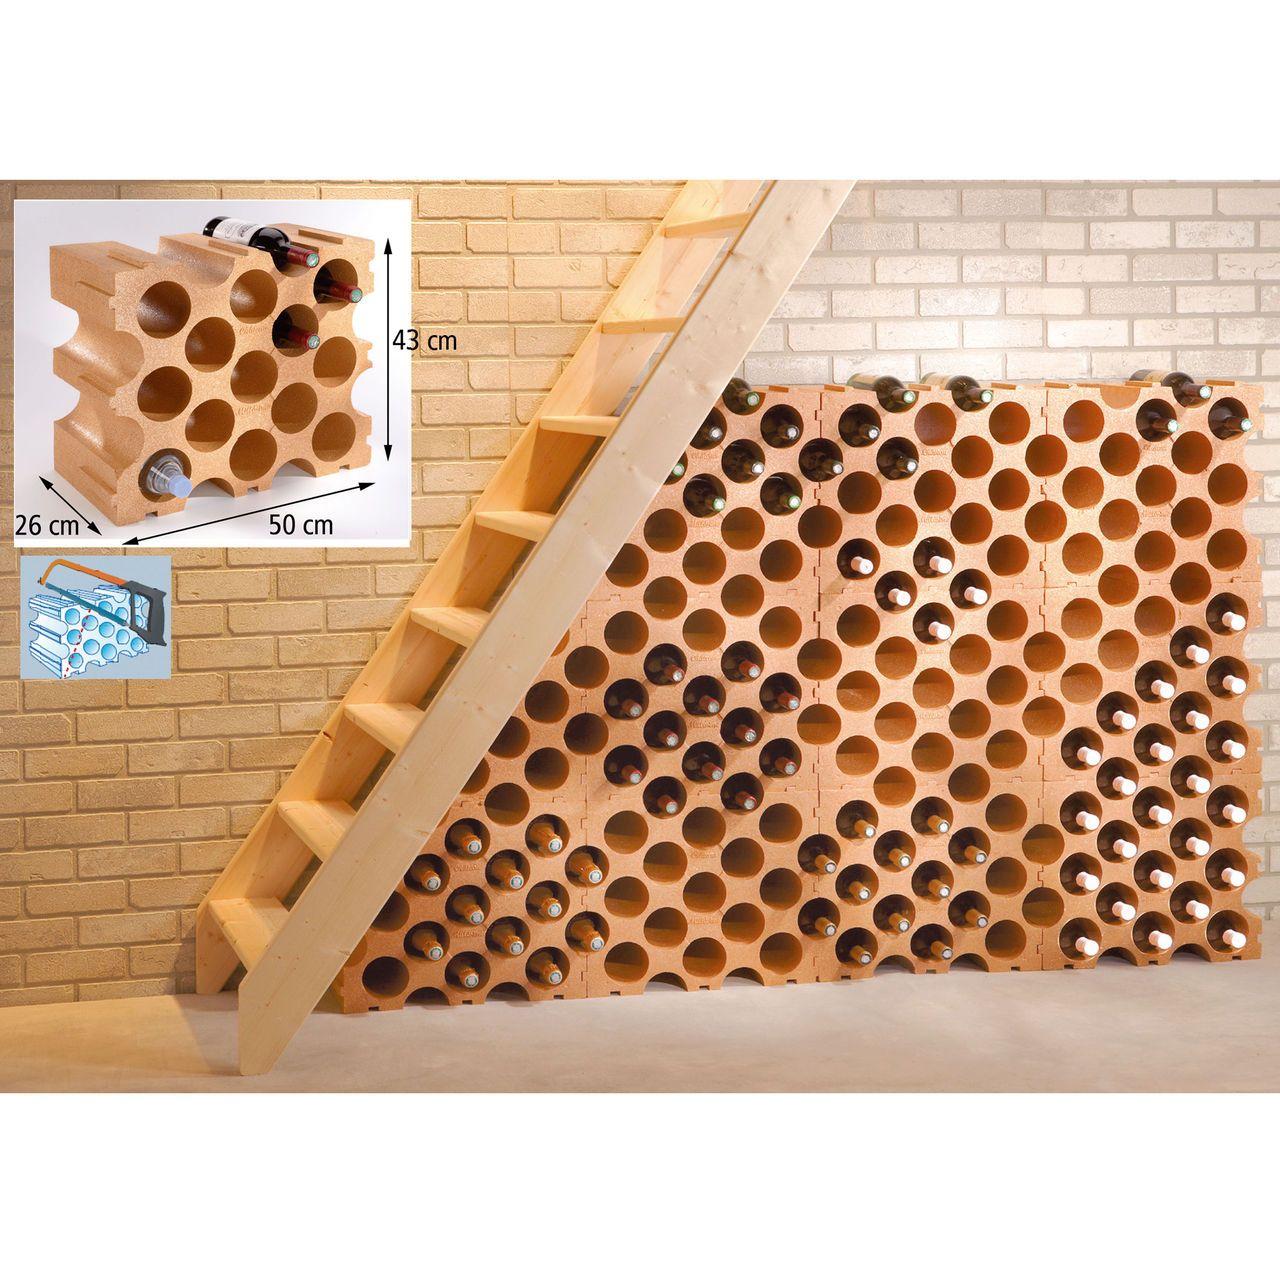 Wine Rack Terracotta Synthetic Material Adega Casas Projetos